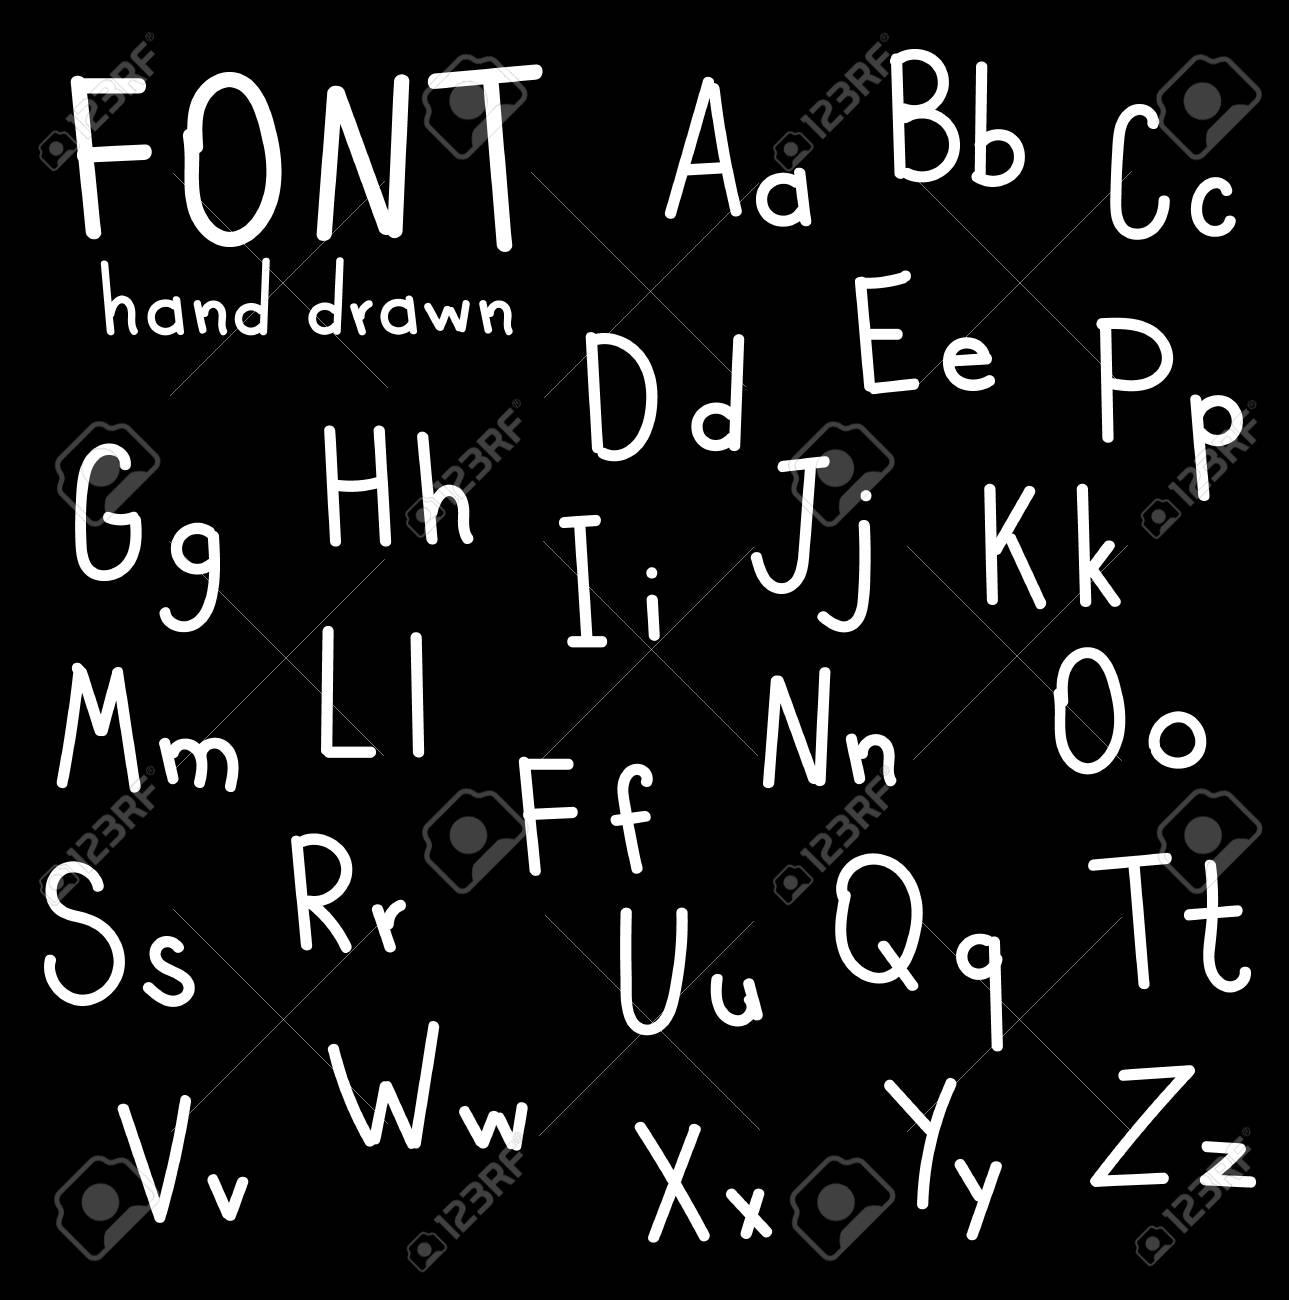 Hand Font Draw Handwritten Alphabet Brush Style Modern Calligraphy Printed Font Lettering Vector Font Alphabet Set Of Vector Letters Written Vector